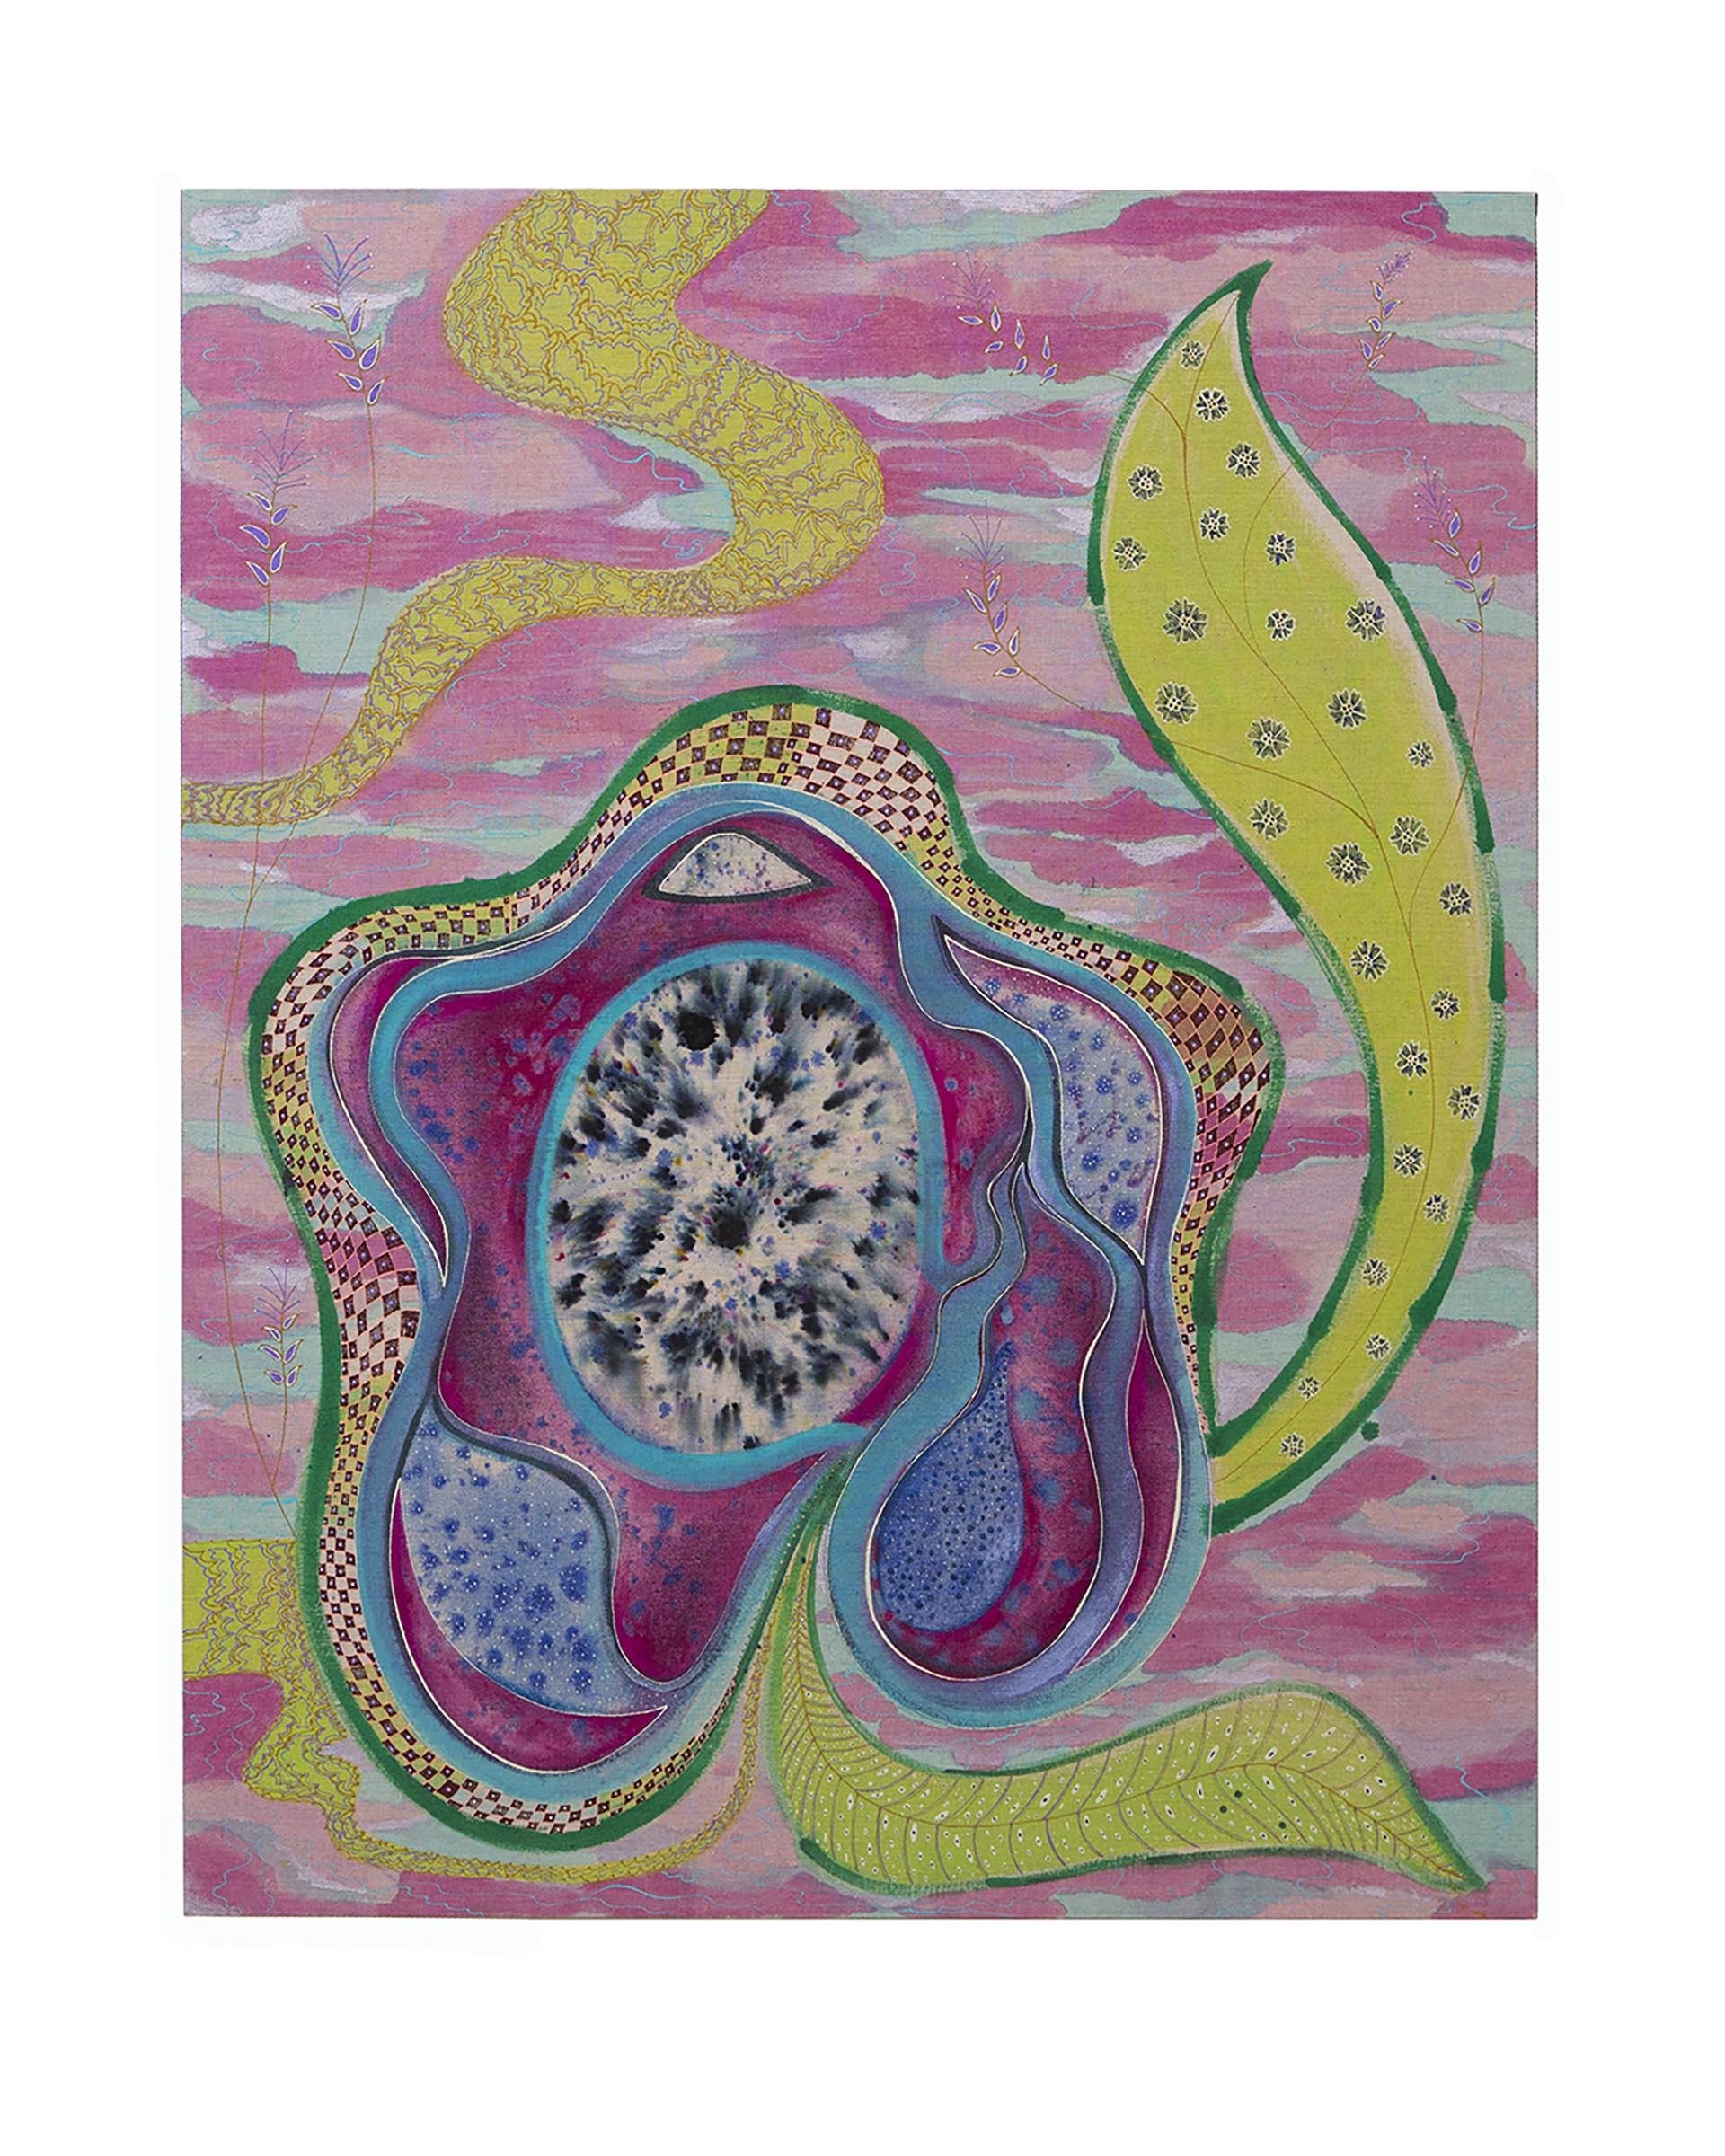 Natessa Amin, Murcury Blooms, Acrylic, mica, dye on linen, 36